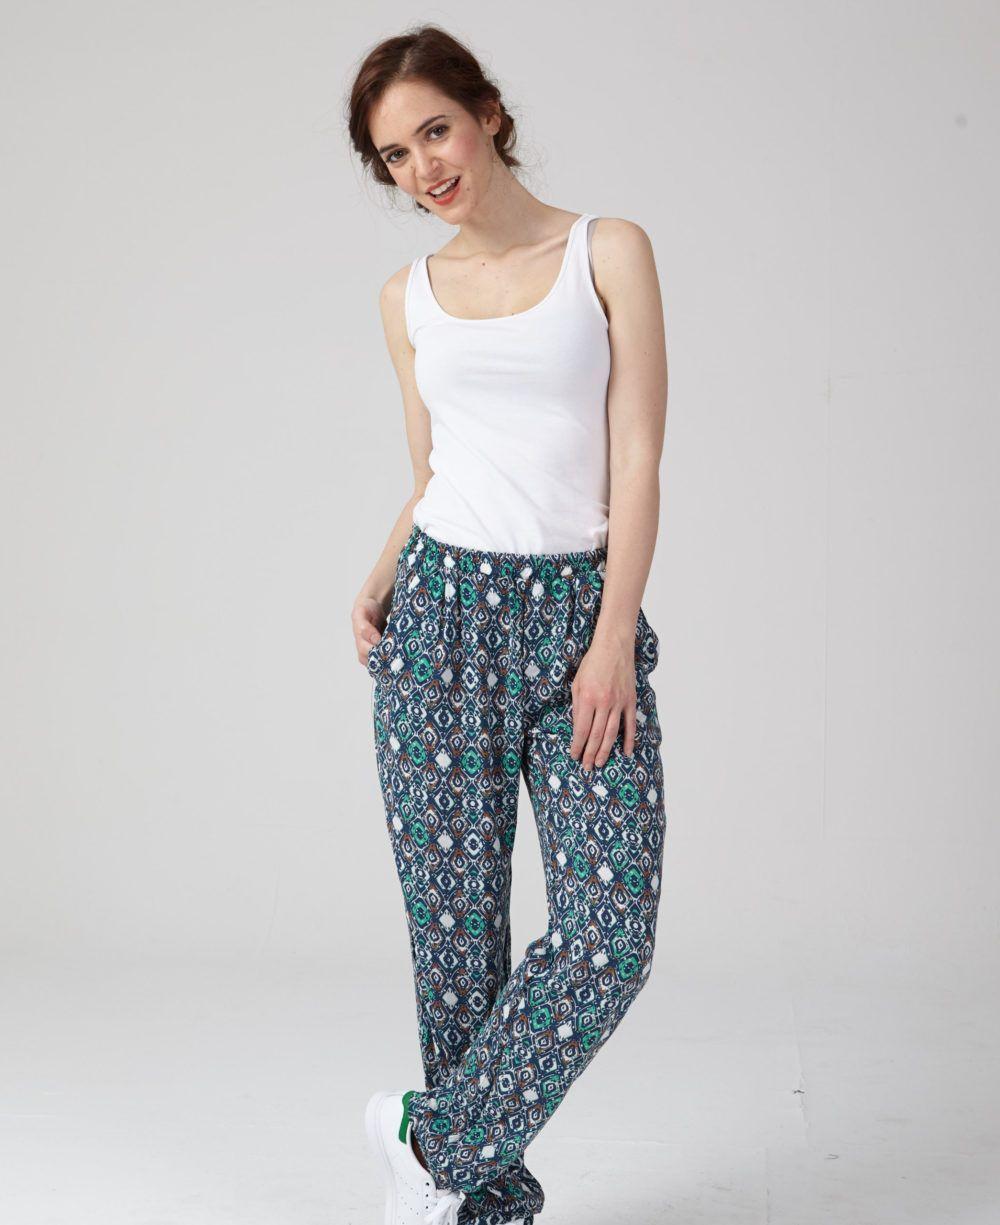 patron couture pantalon facile philippe en bleu